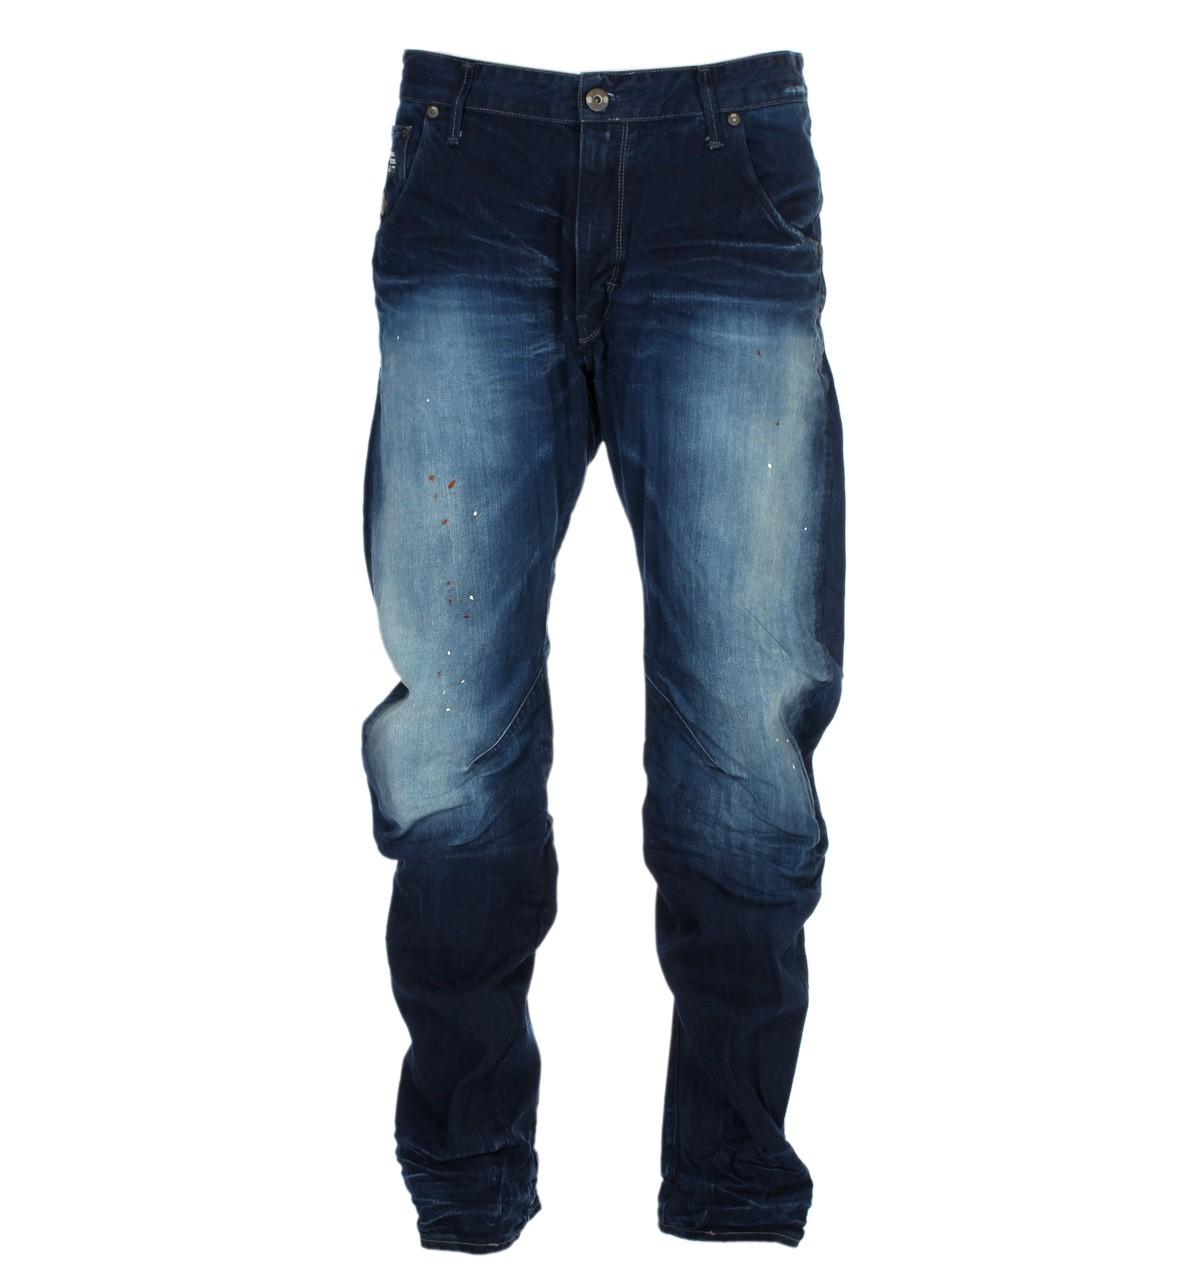 g star arc 3d loose tapered medium aged jeans pillar denim. Black Bedroom Furniture Sets. Home Design Ideas